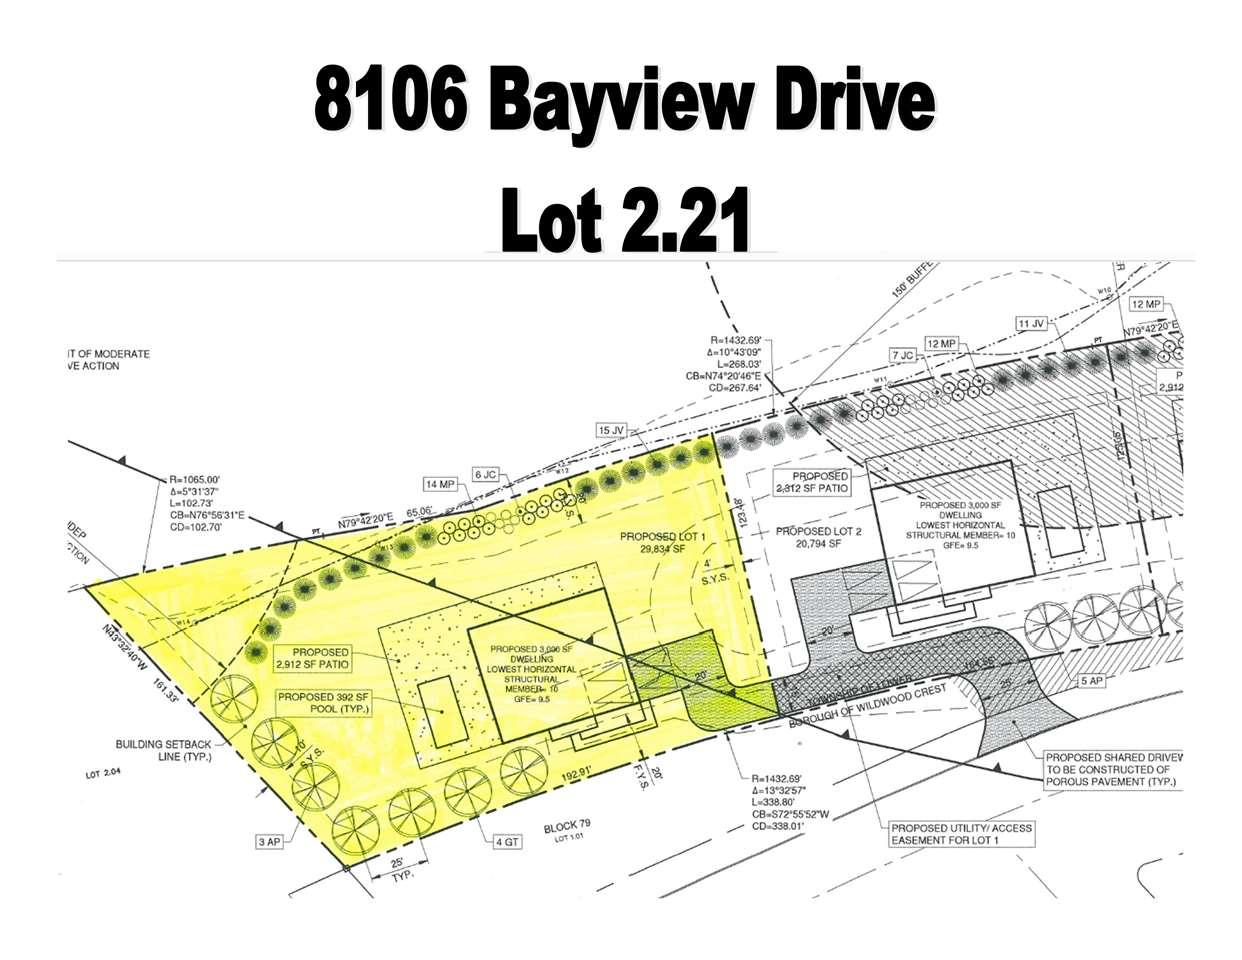 8106 Bayview Drive